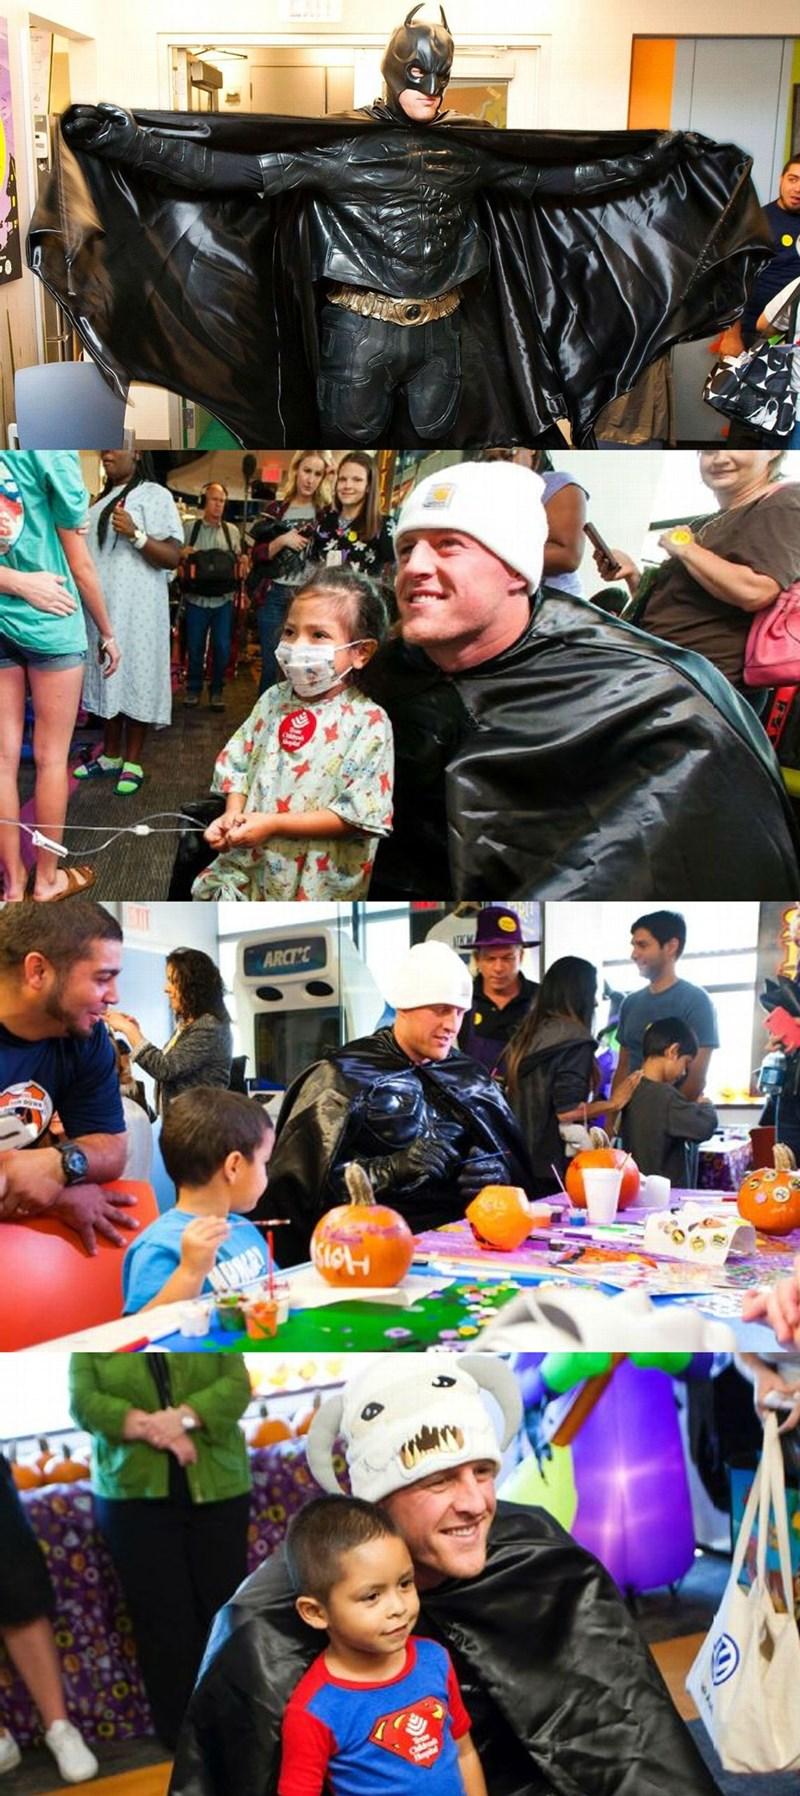 batman superheroes Texans' J.J. Watt Surprised Kids in a Hospital as Batman